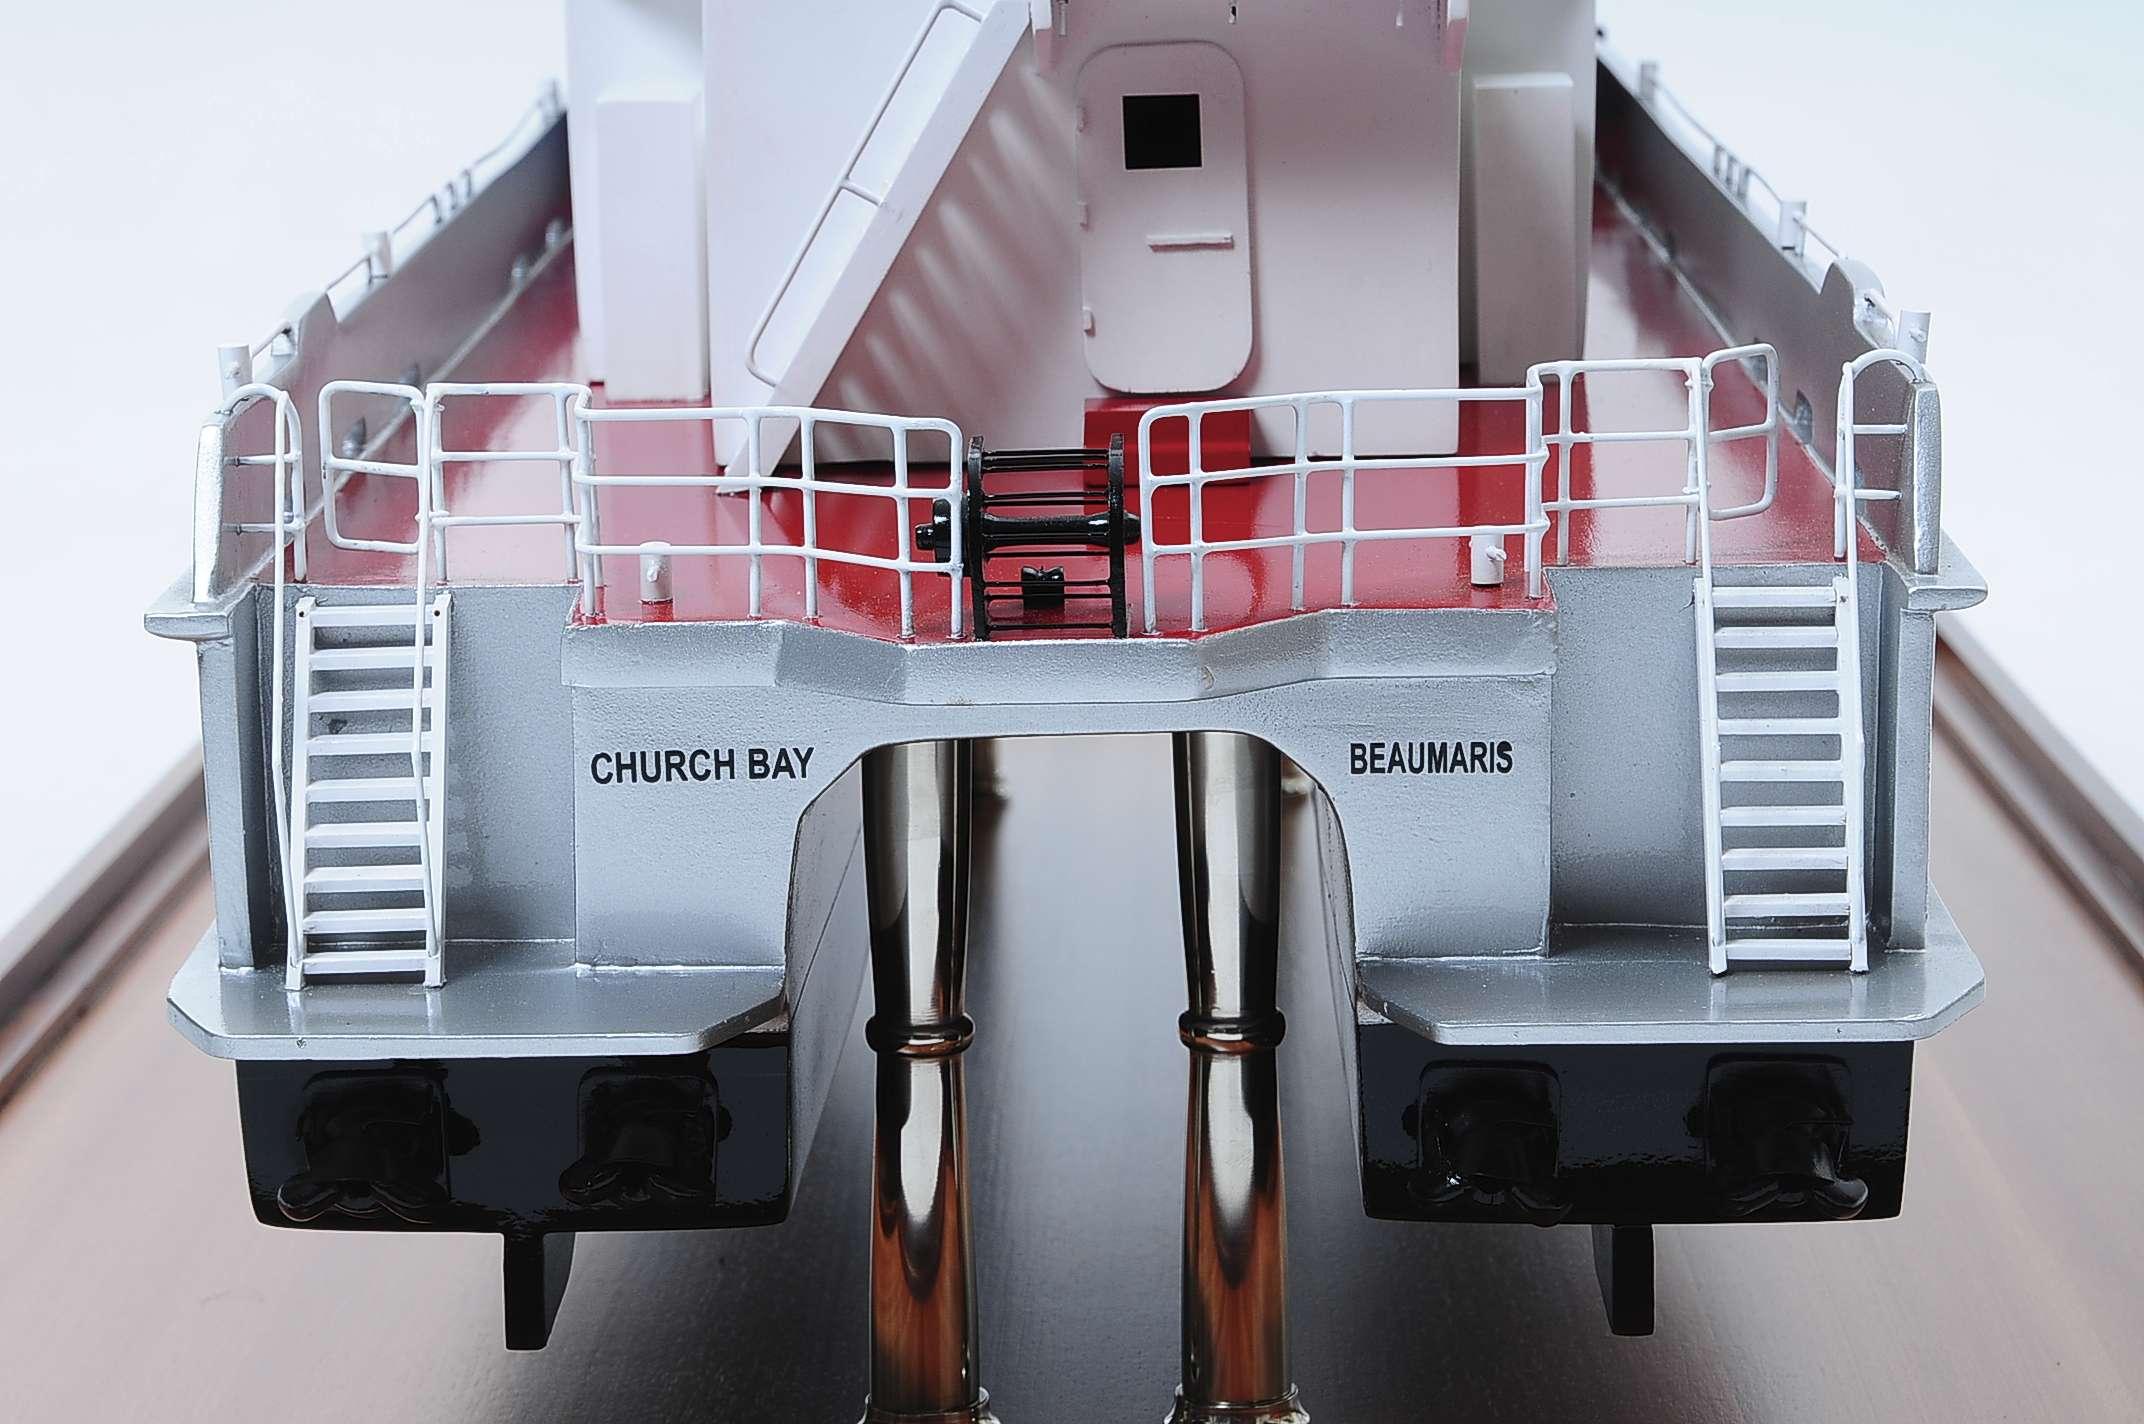 1439-4938-Turbine-Transfer-Catamaran-Model